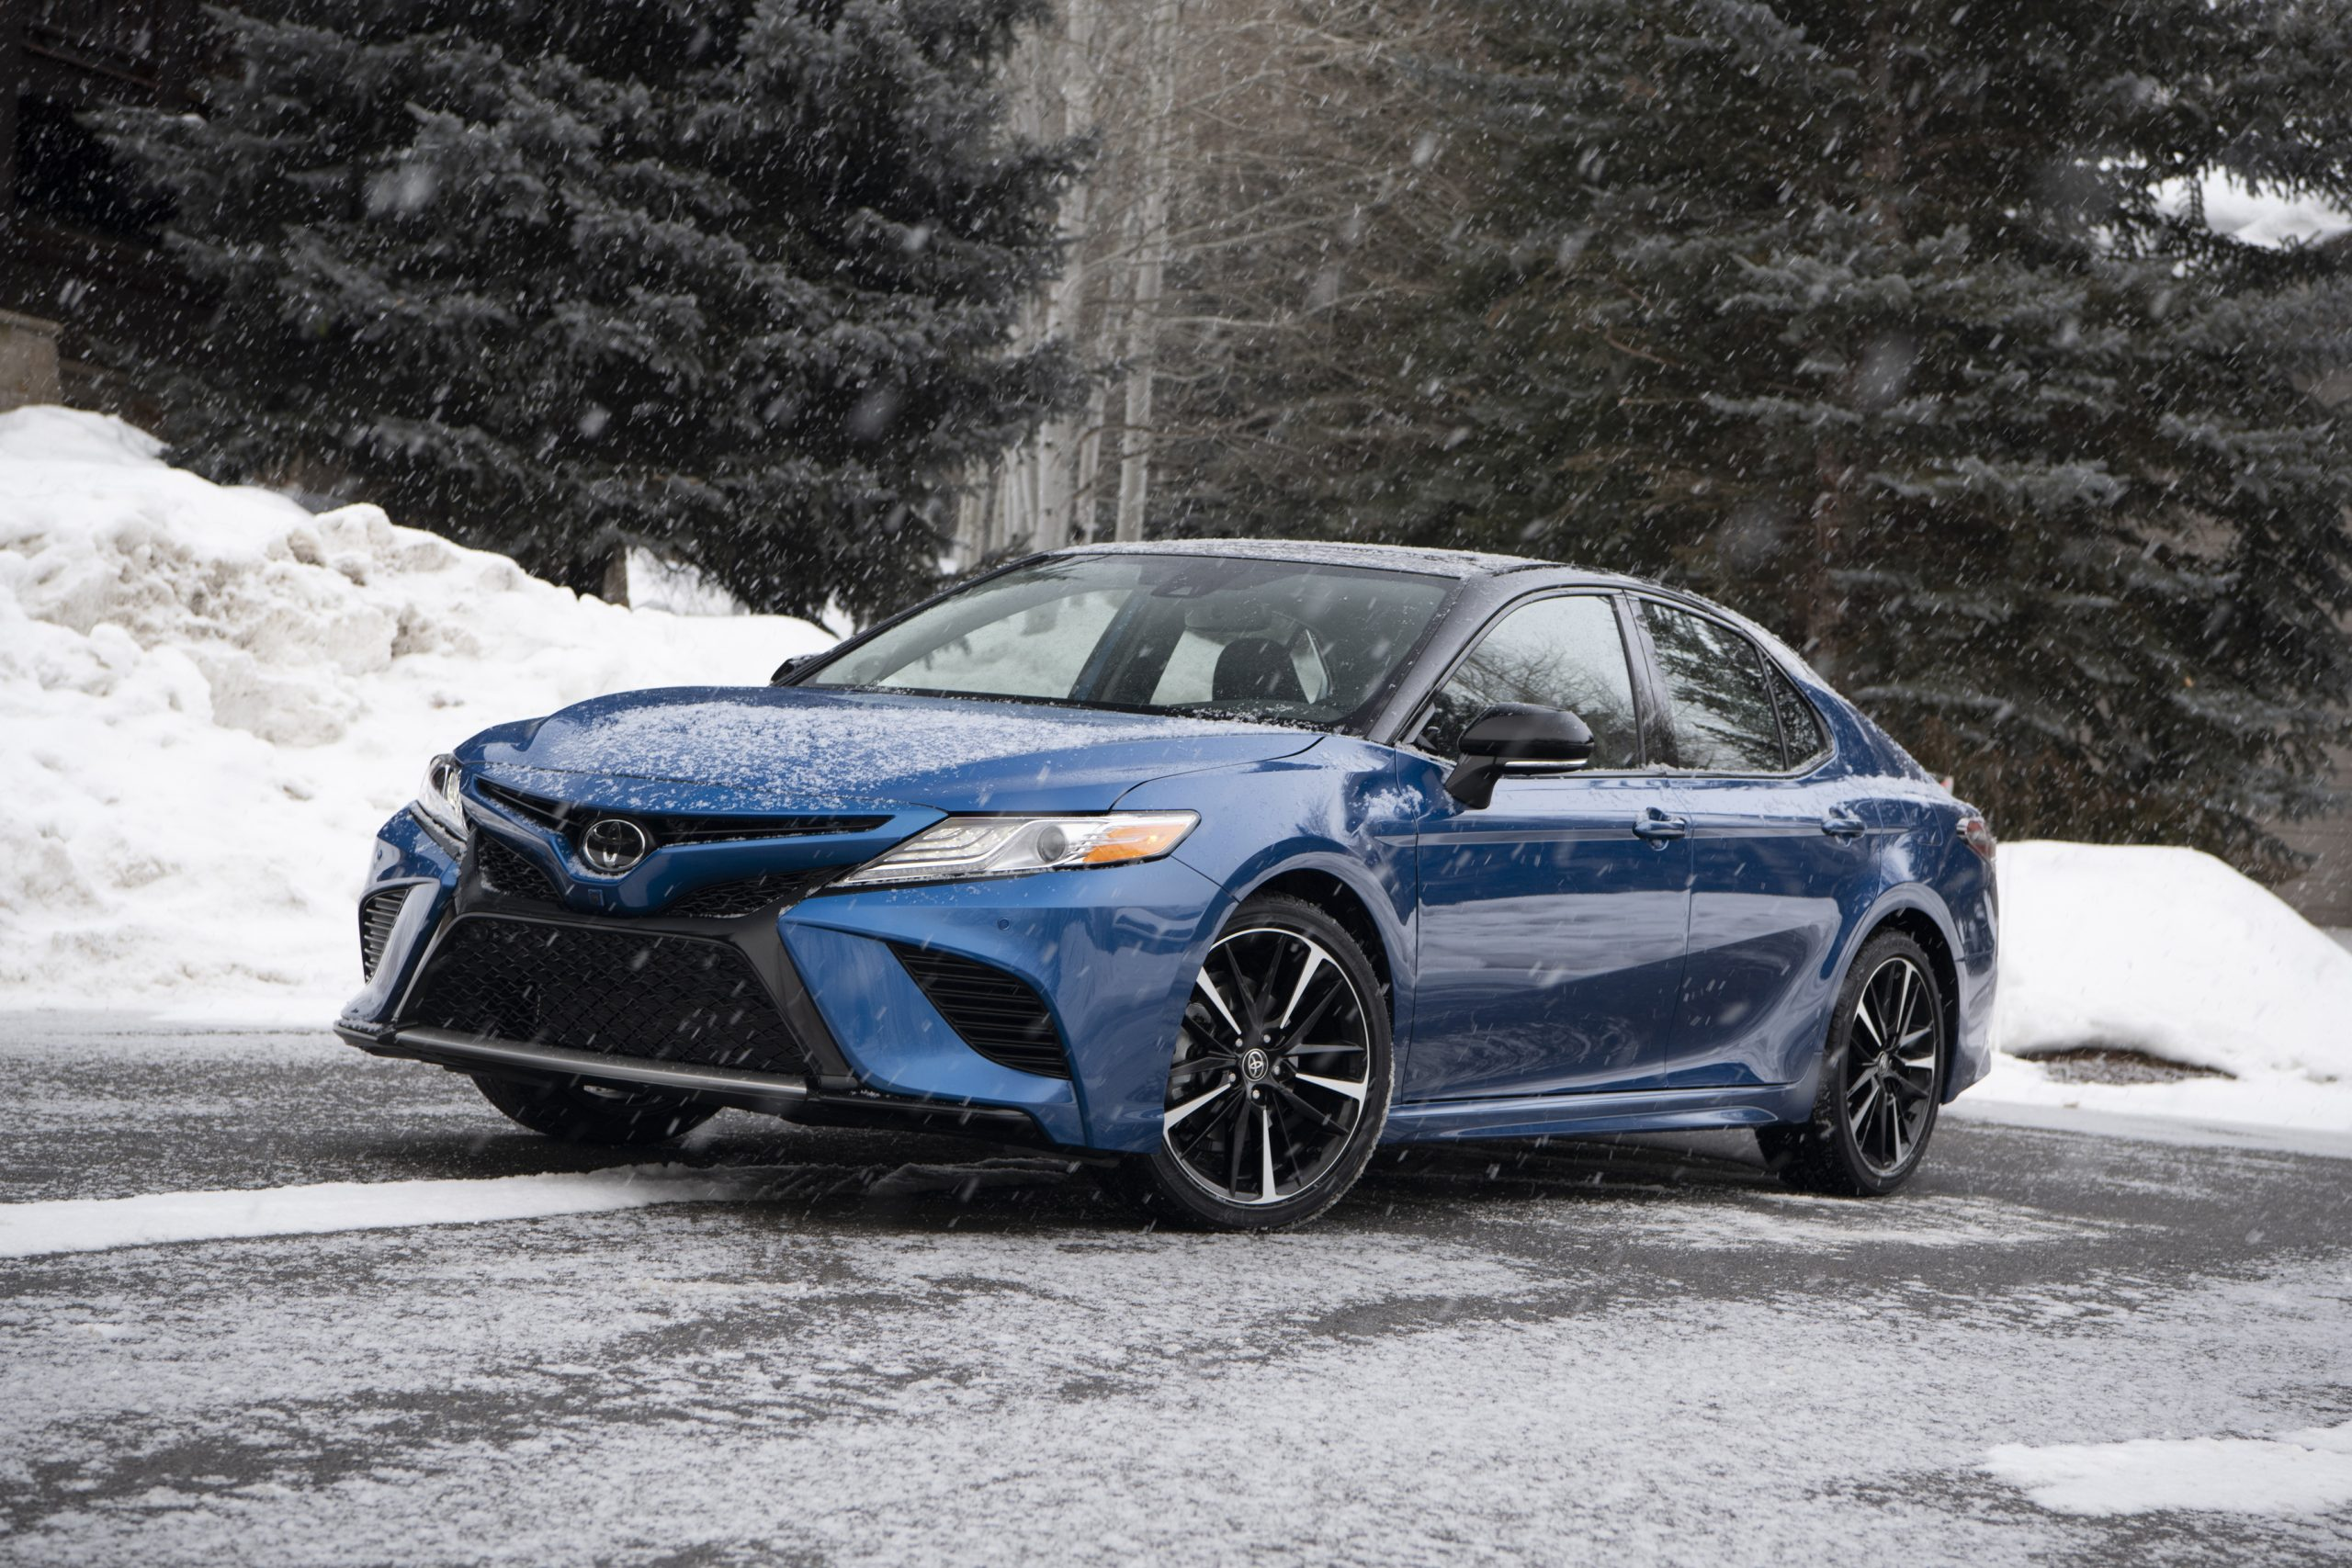 2020 Toyota Camry Awd Avalon Awd Namastecar